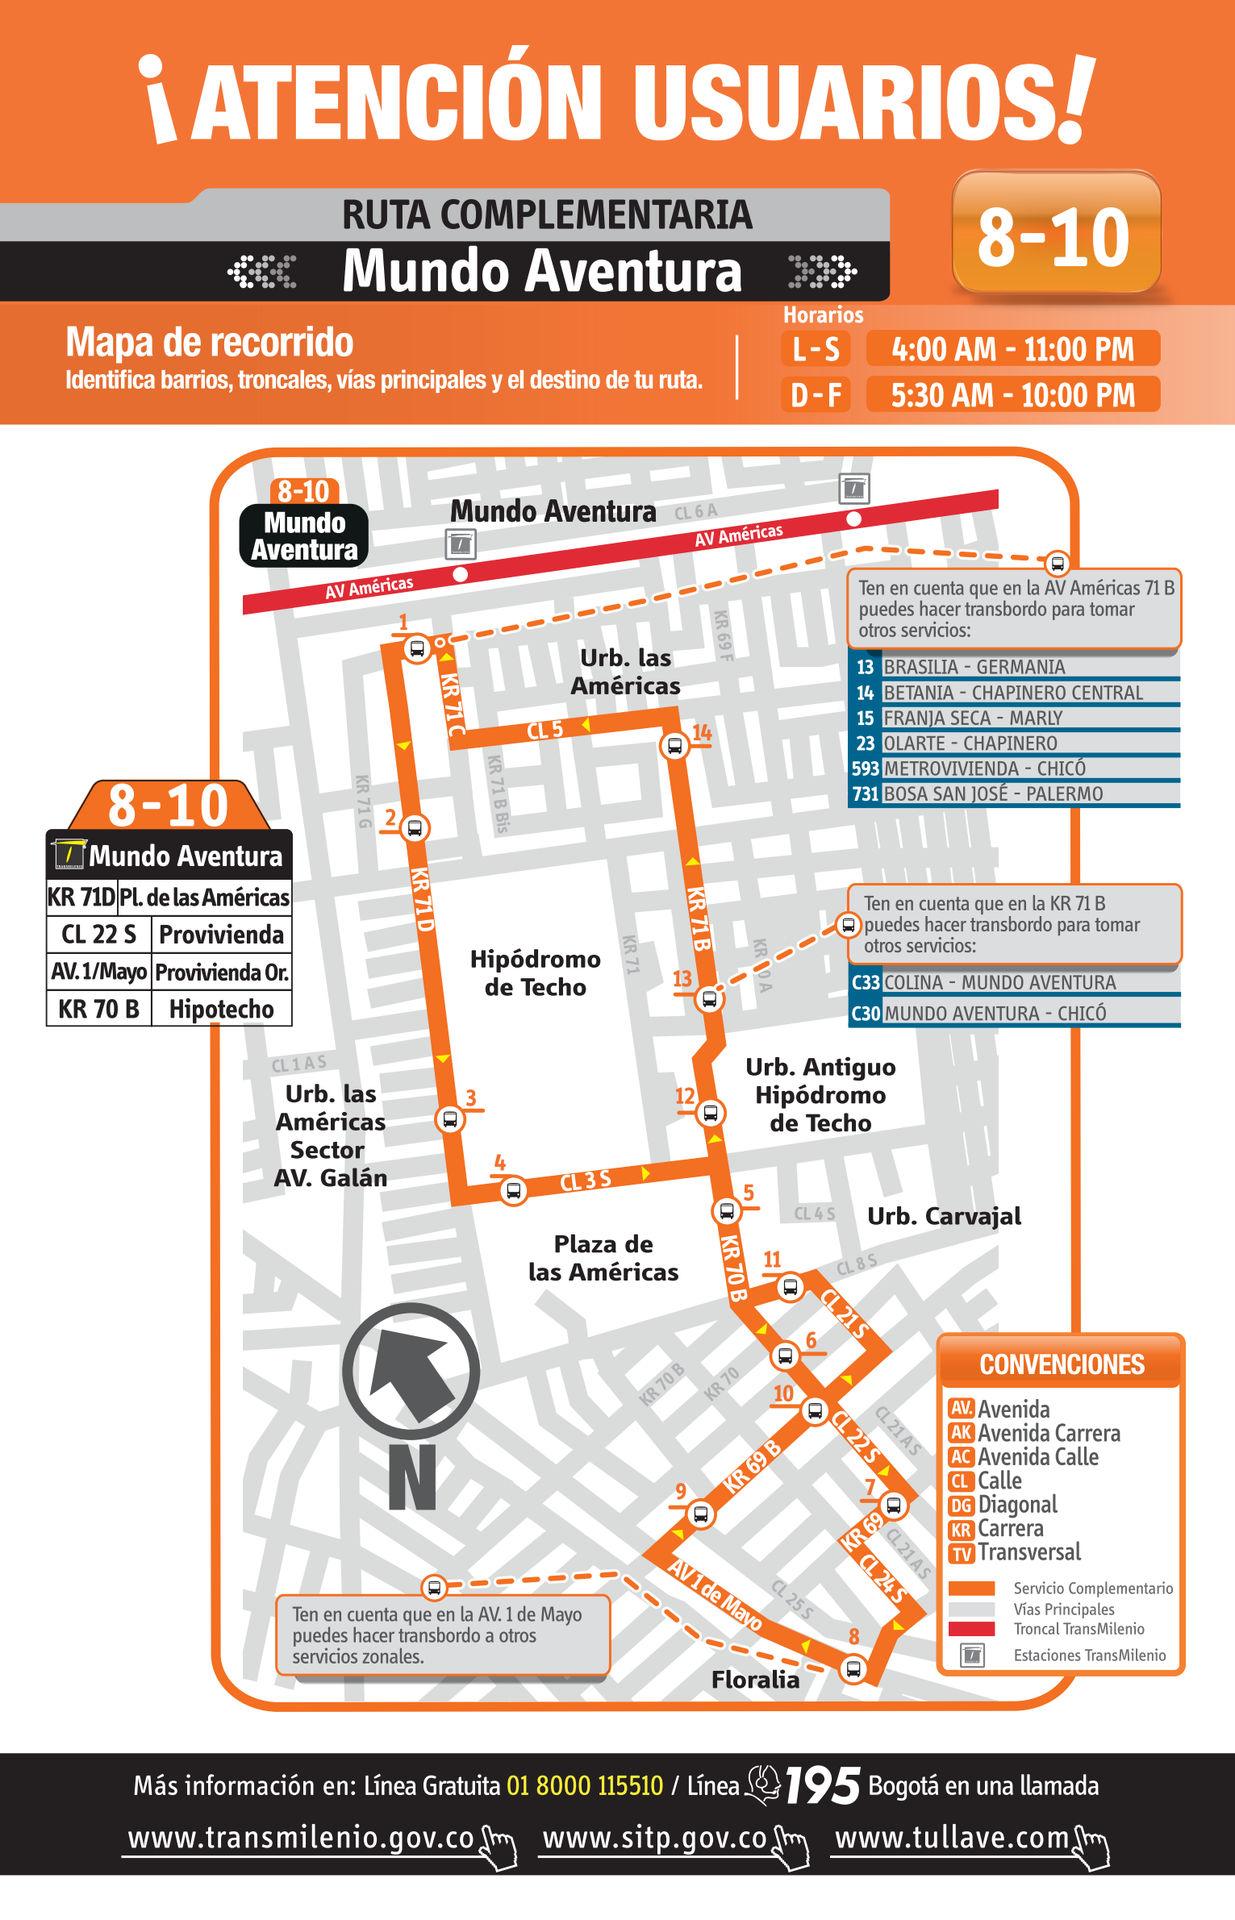 Ruta SITP: 8-10 → Mundo Aventura [Complementaria]